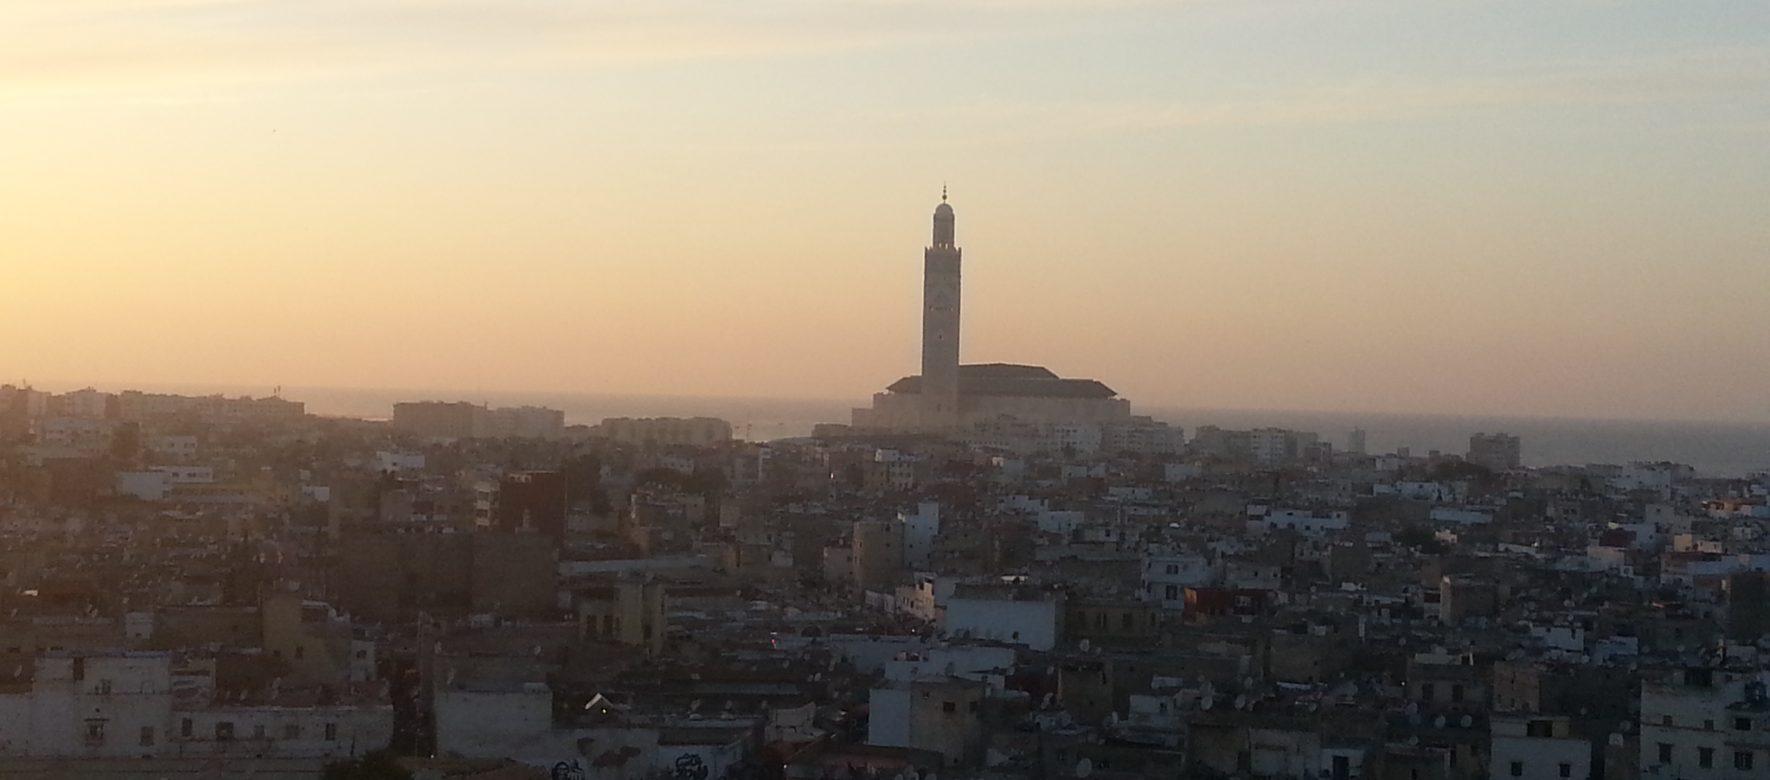 Le Maroc veut faciliter les relations administration-usagers